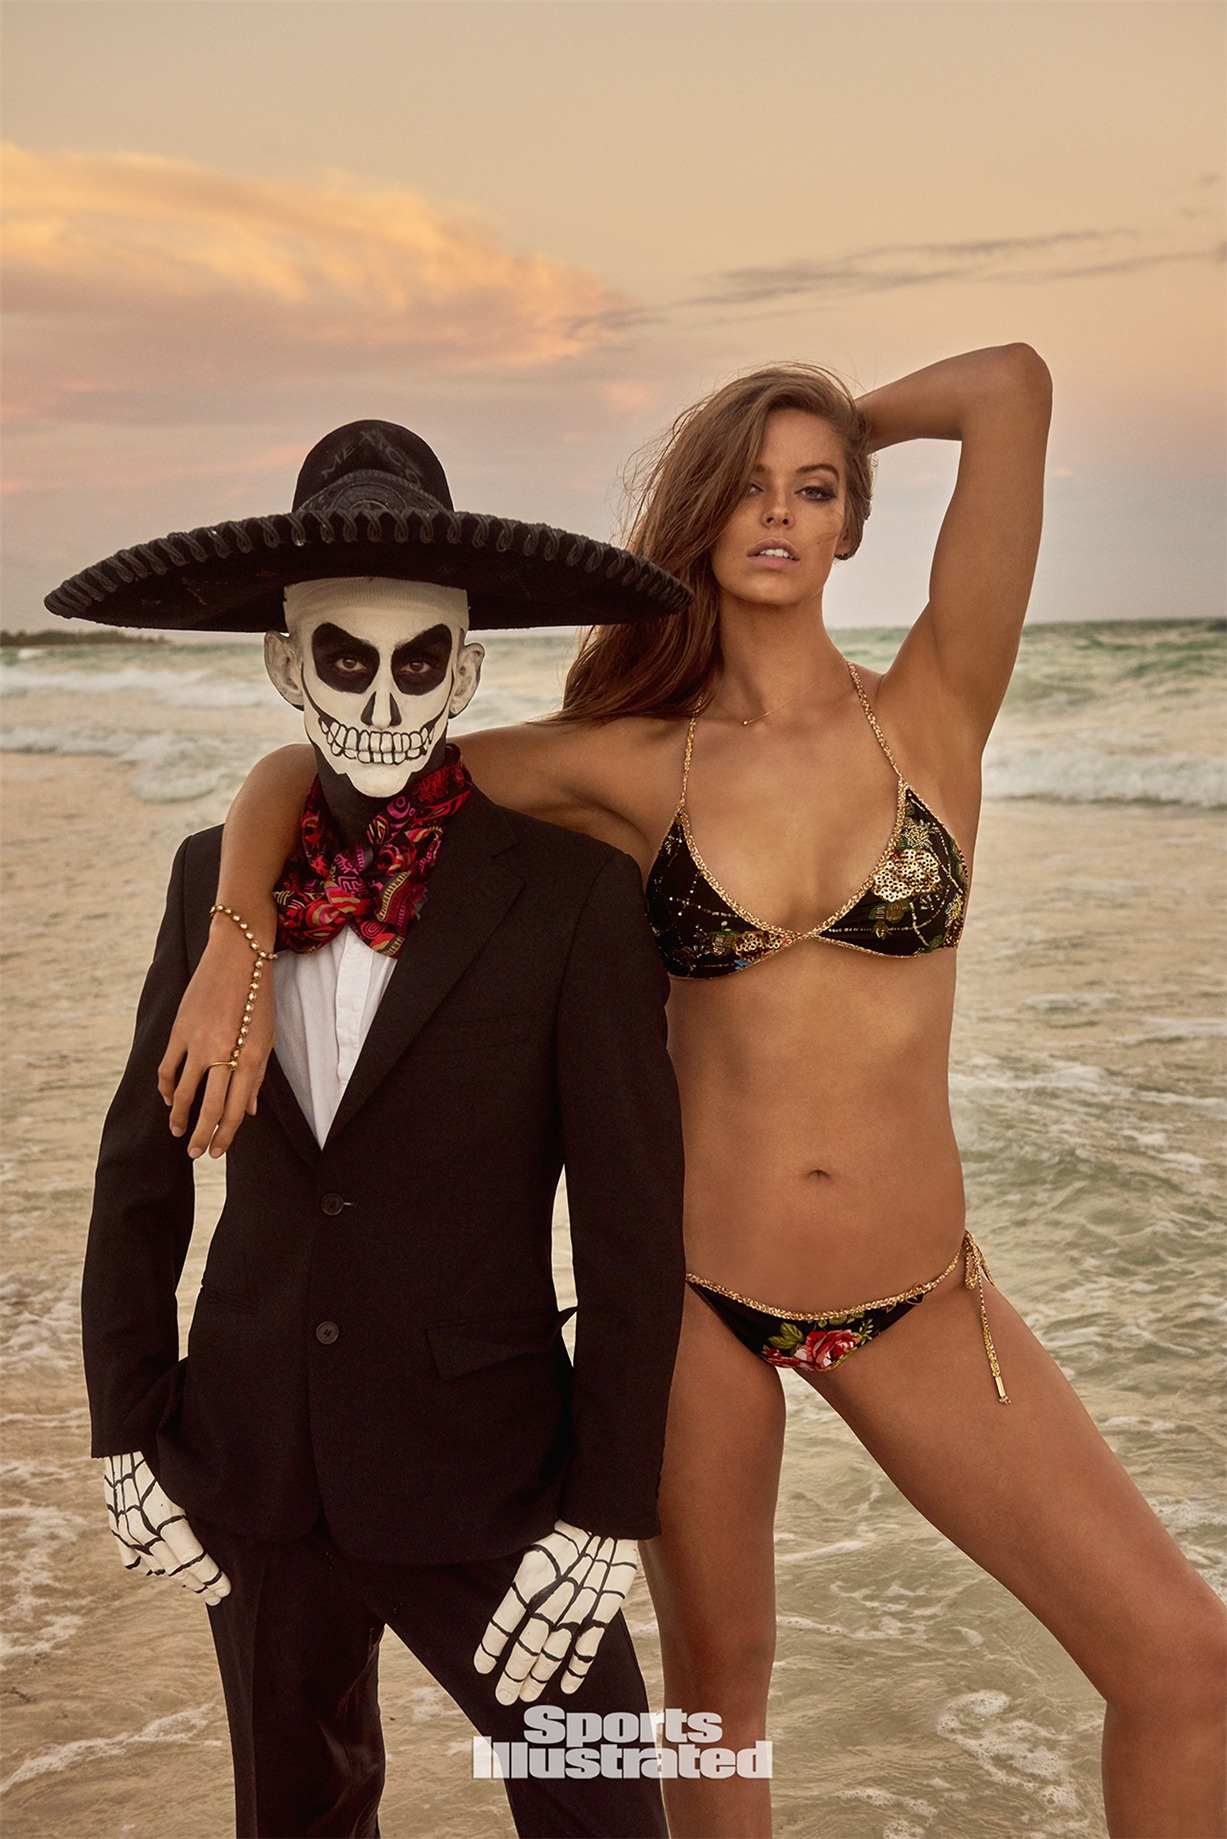 Robyn Lawley / Робин Лоули в купальниках из новой коллекции Sports Illustrated Swimsuit 2017 issue / in Mexico by Ruven Afanador